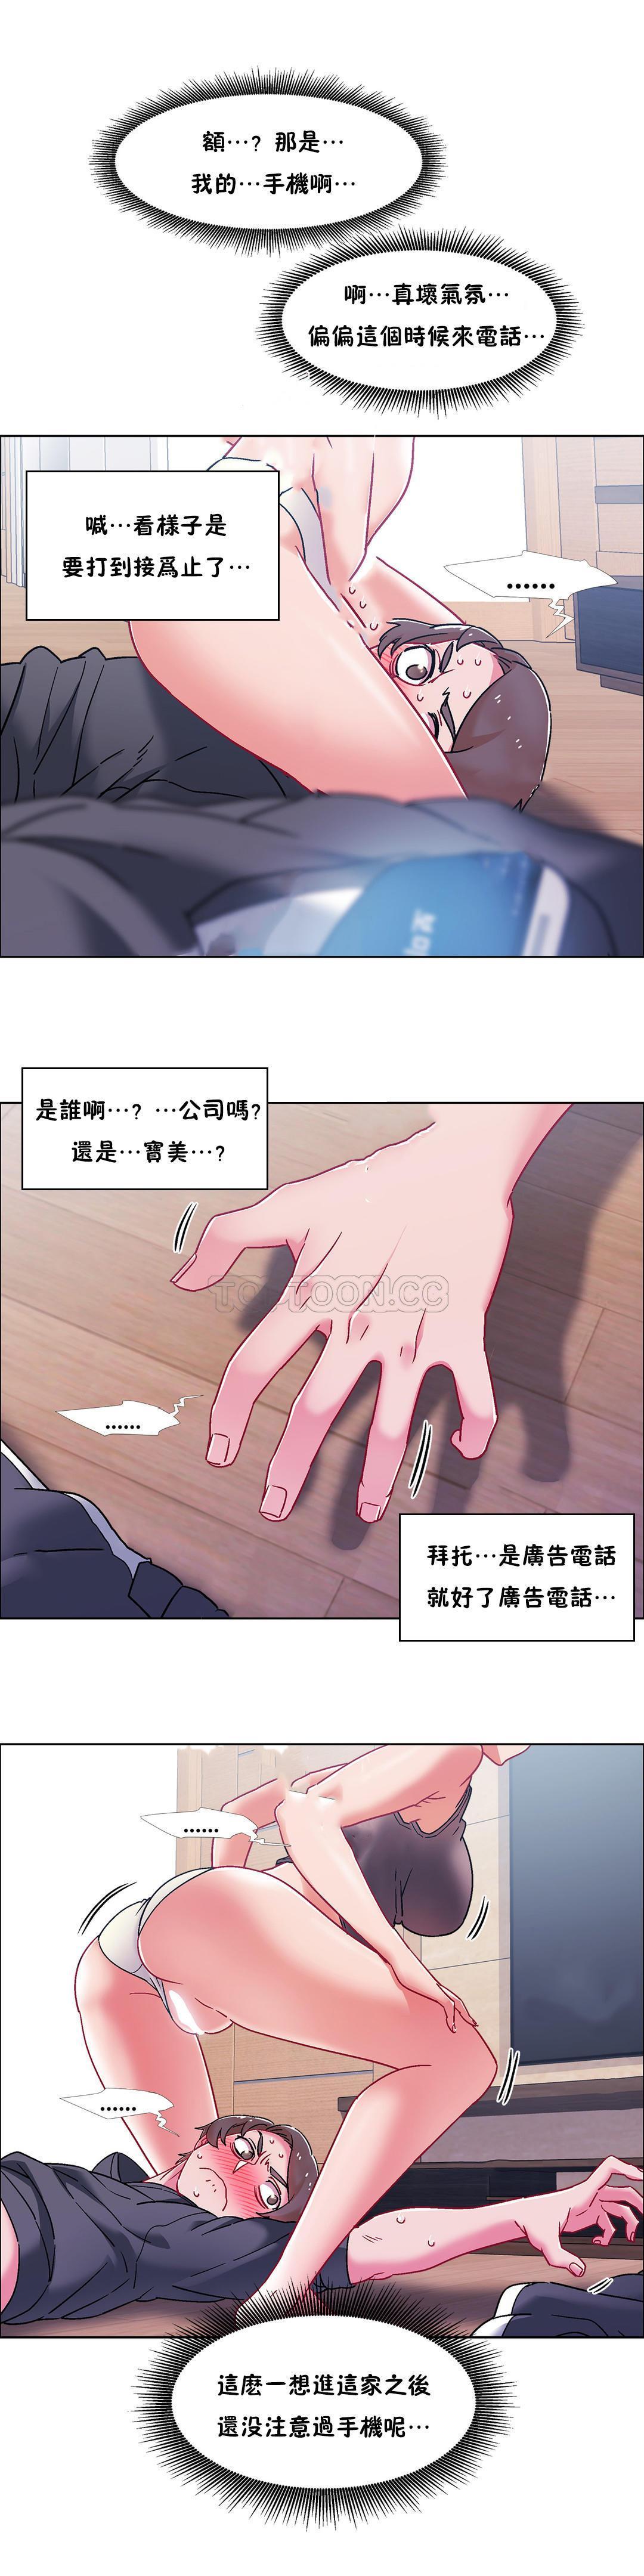 [Studio Wannabe] Rental Girls | 出租女郎 Ch. 33-58 [Chinese]  第二季 完结 385